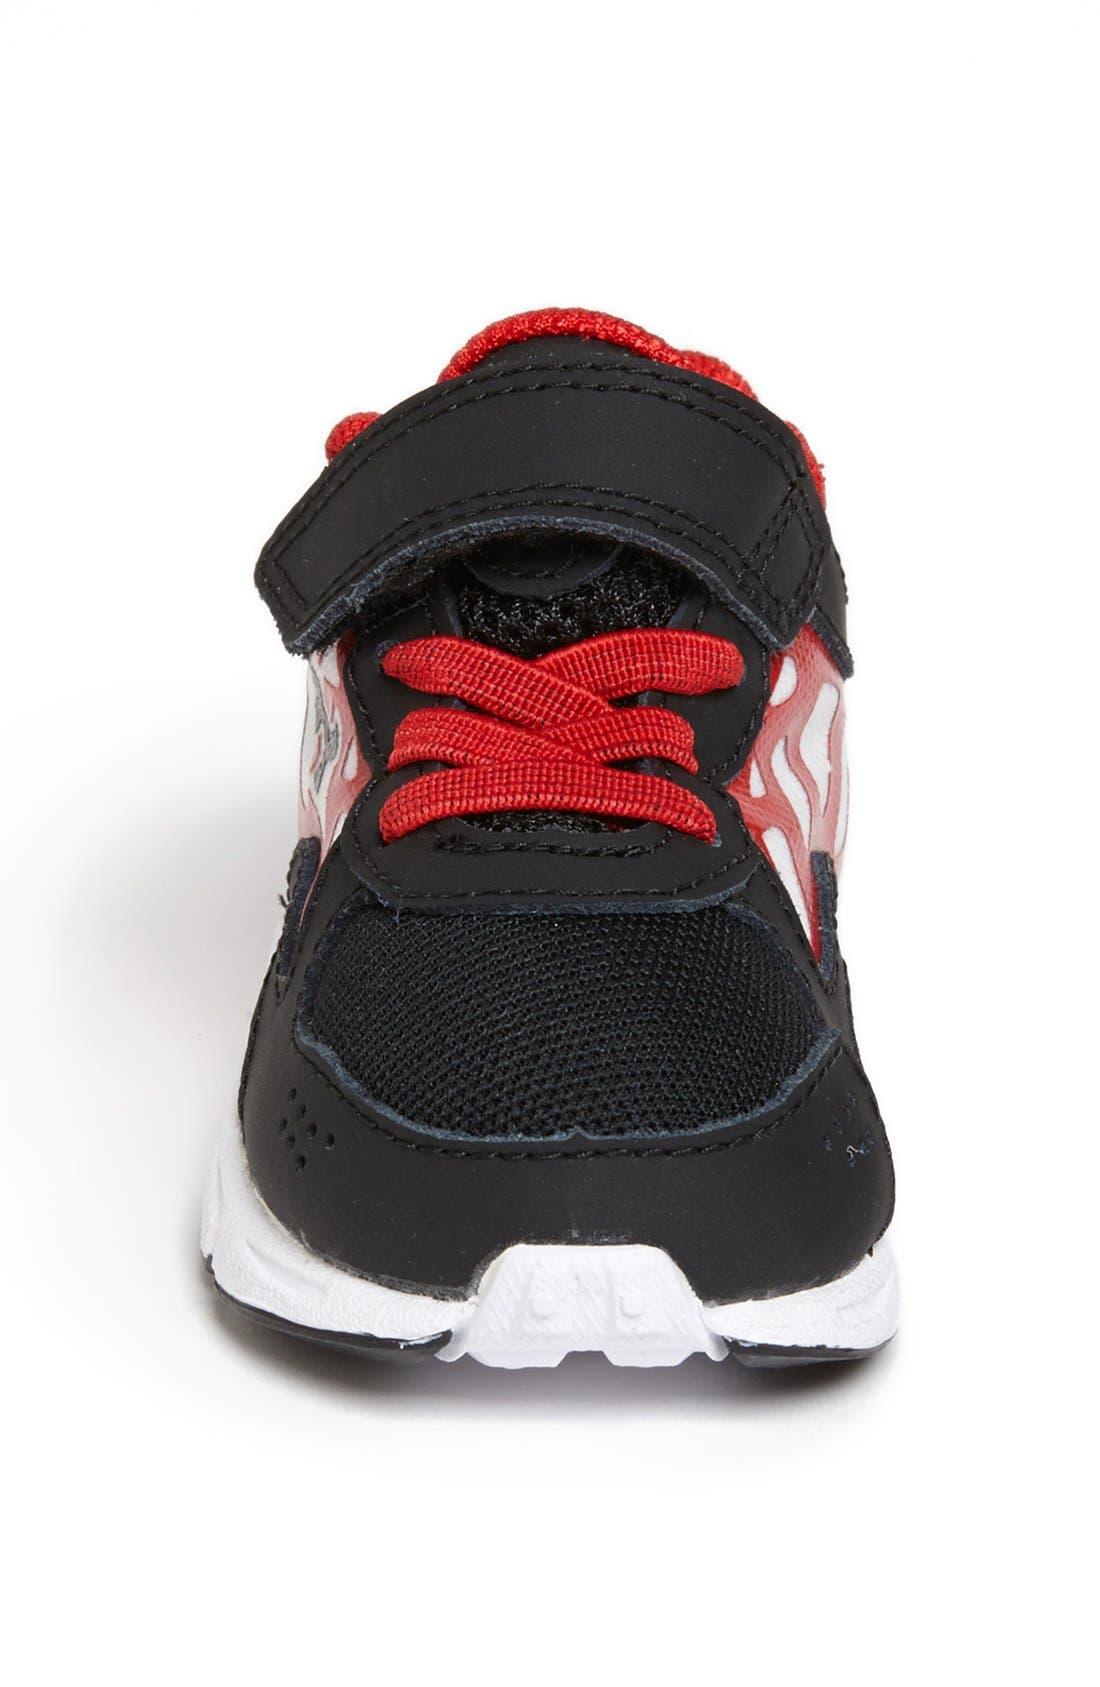 Alternate Image 3  - Under Armour 'Ignite' Sneaker (Baby, Walker & Toddler)